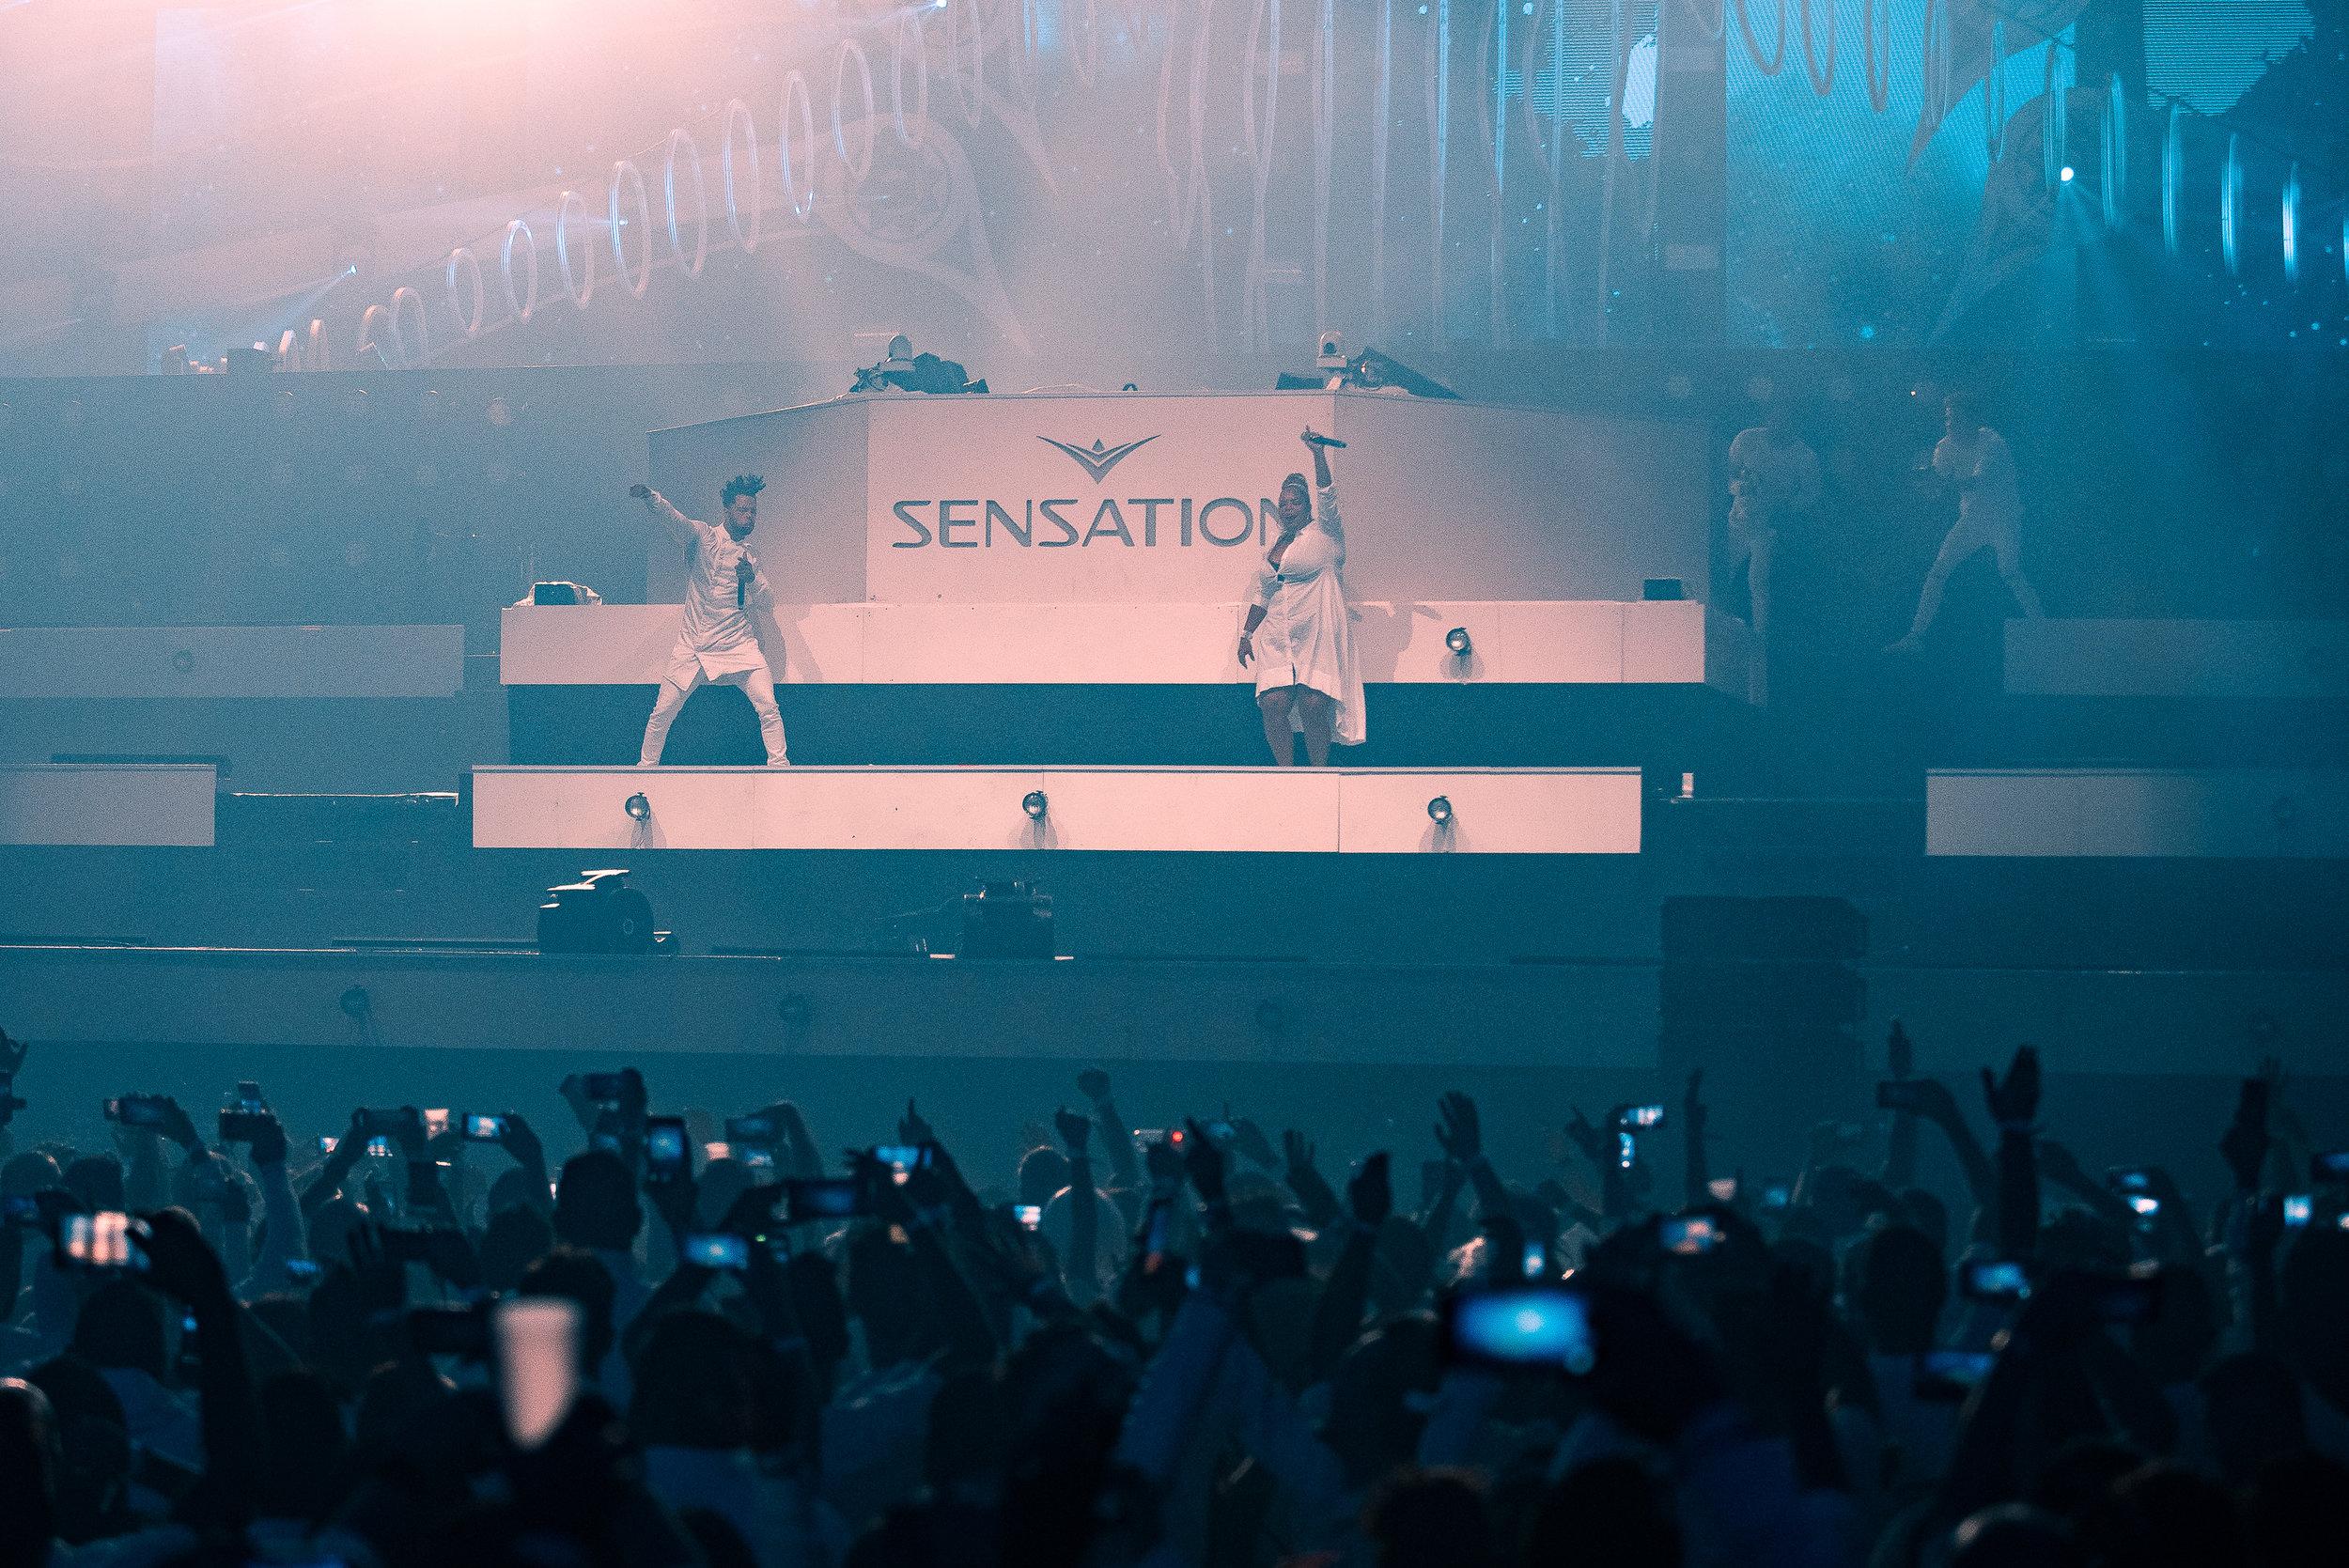 181103_Madrid_sensation rise_032.jpg